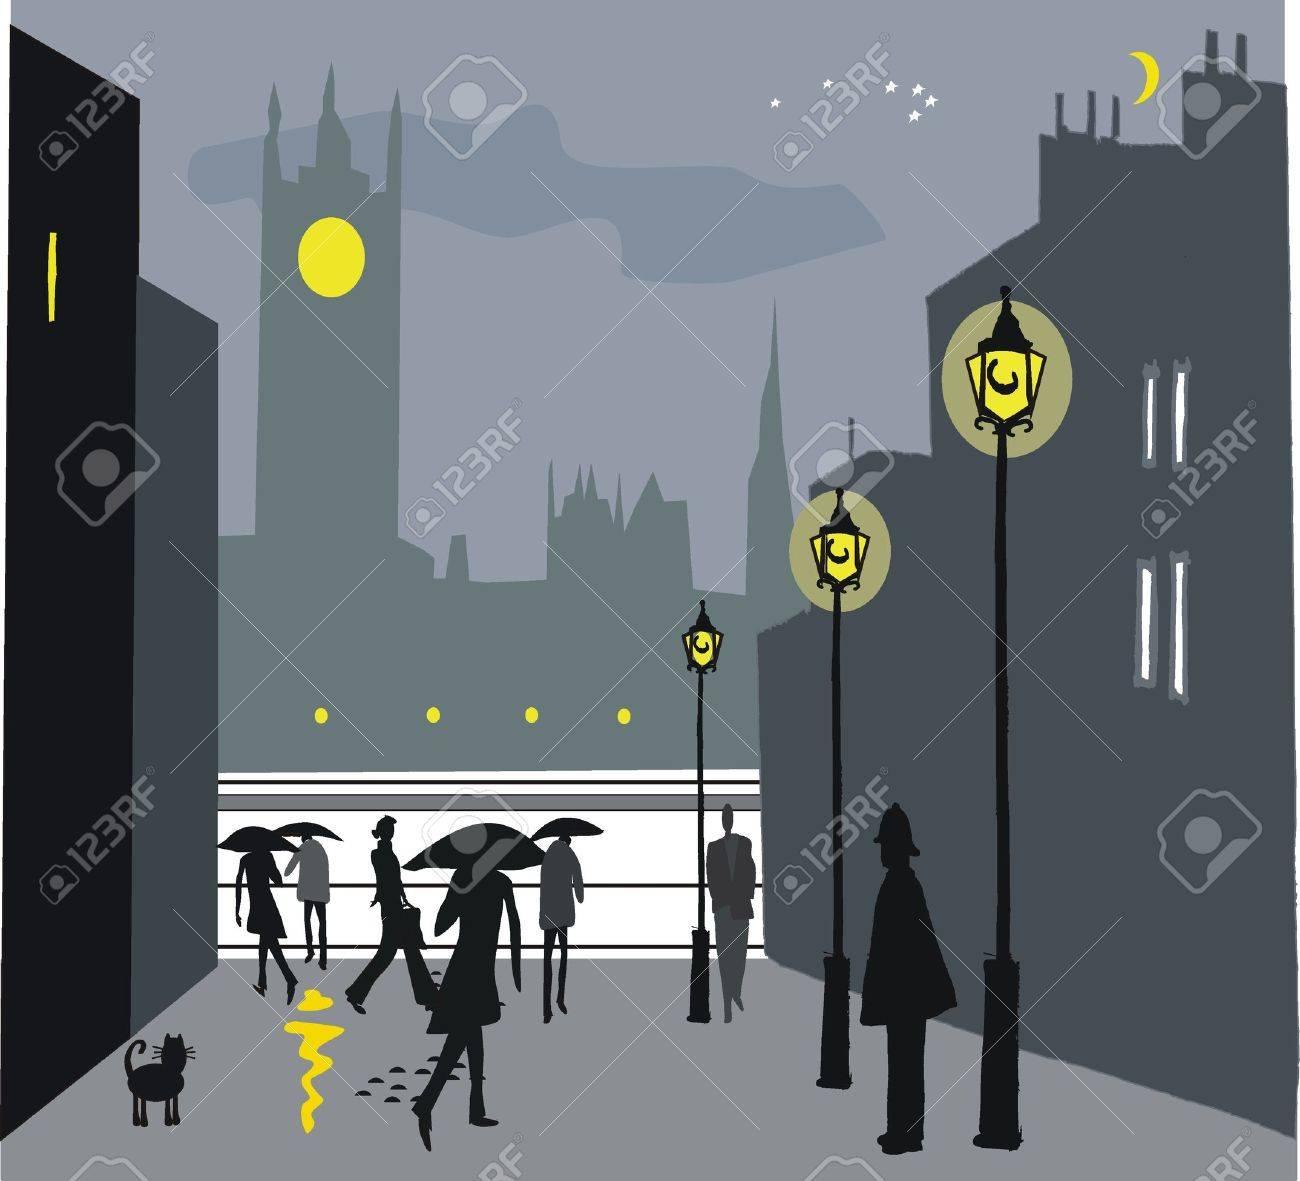 Vector illustration of London pedestrians in rain at night Stock Vector - 11464847